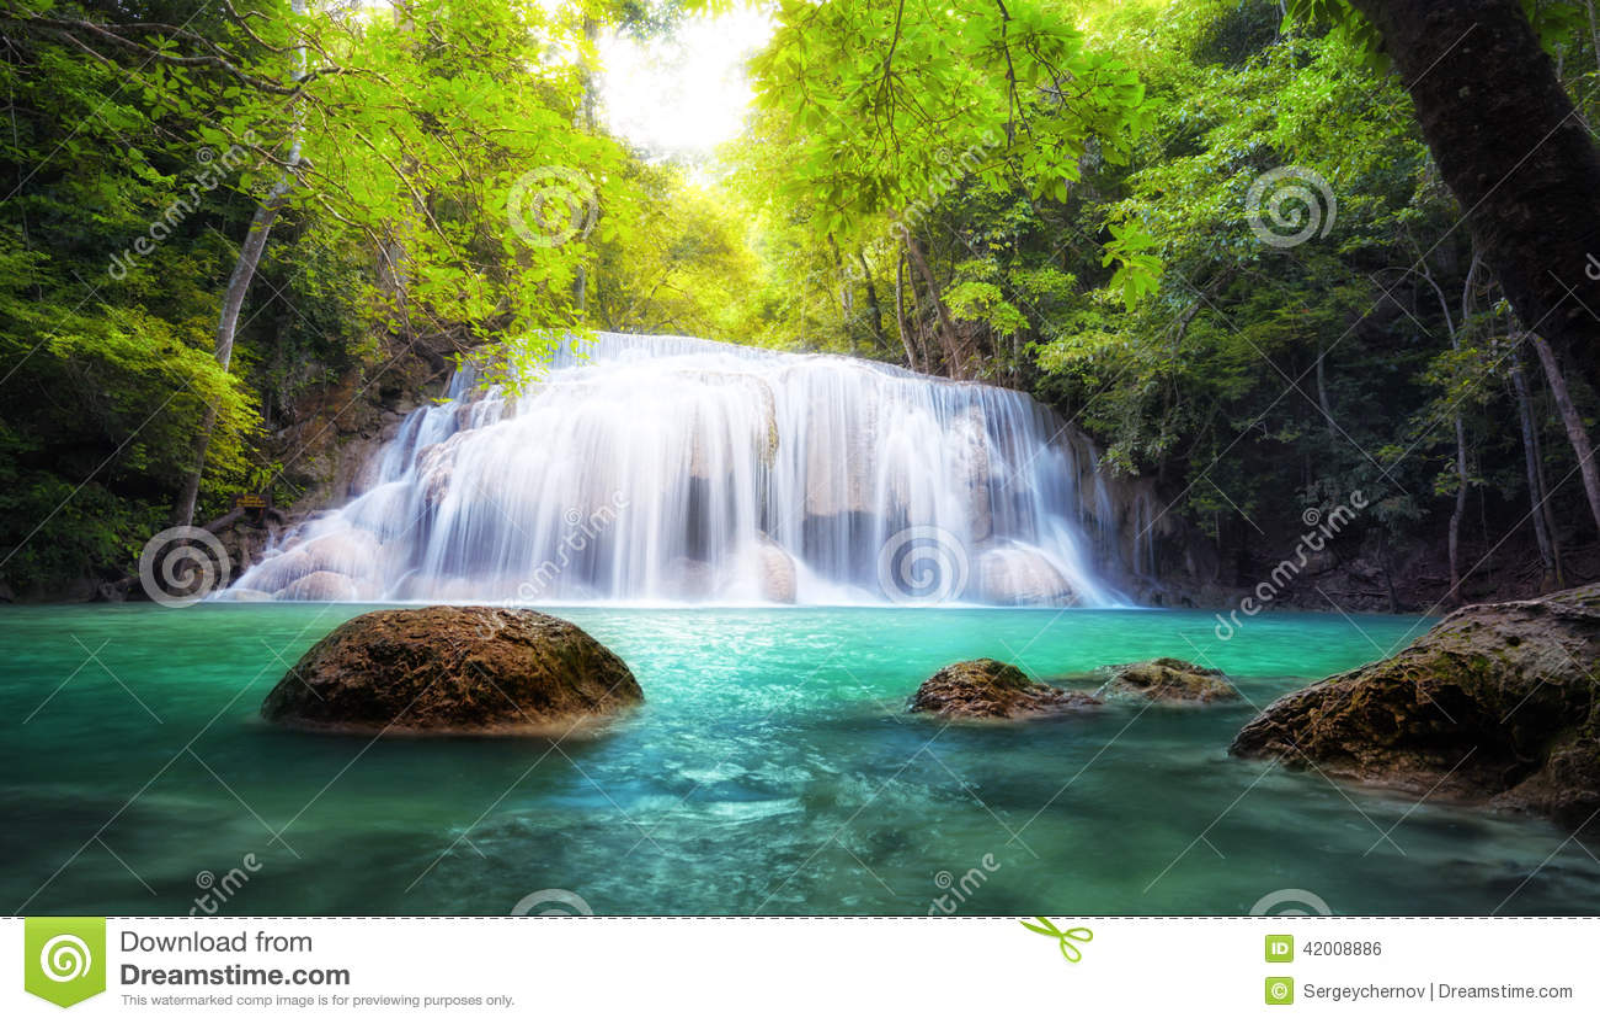 Beautiful waterfall in thailand s erawan waterfalls national park - Tropical Waterfall In Thailand Nature Photography Stock